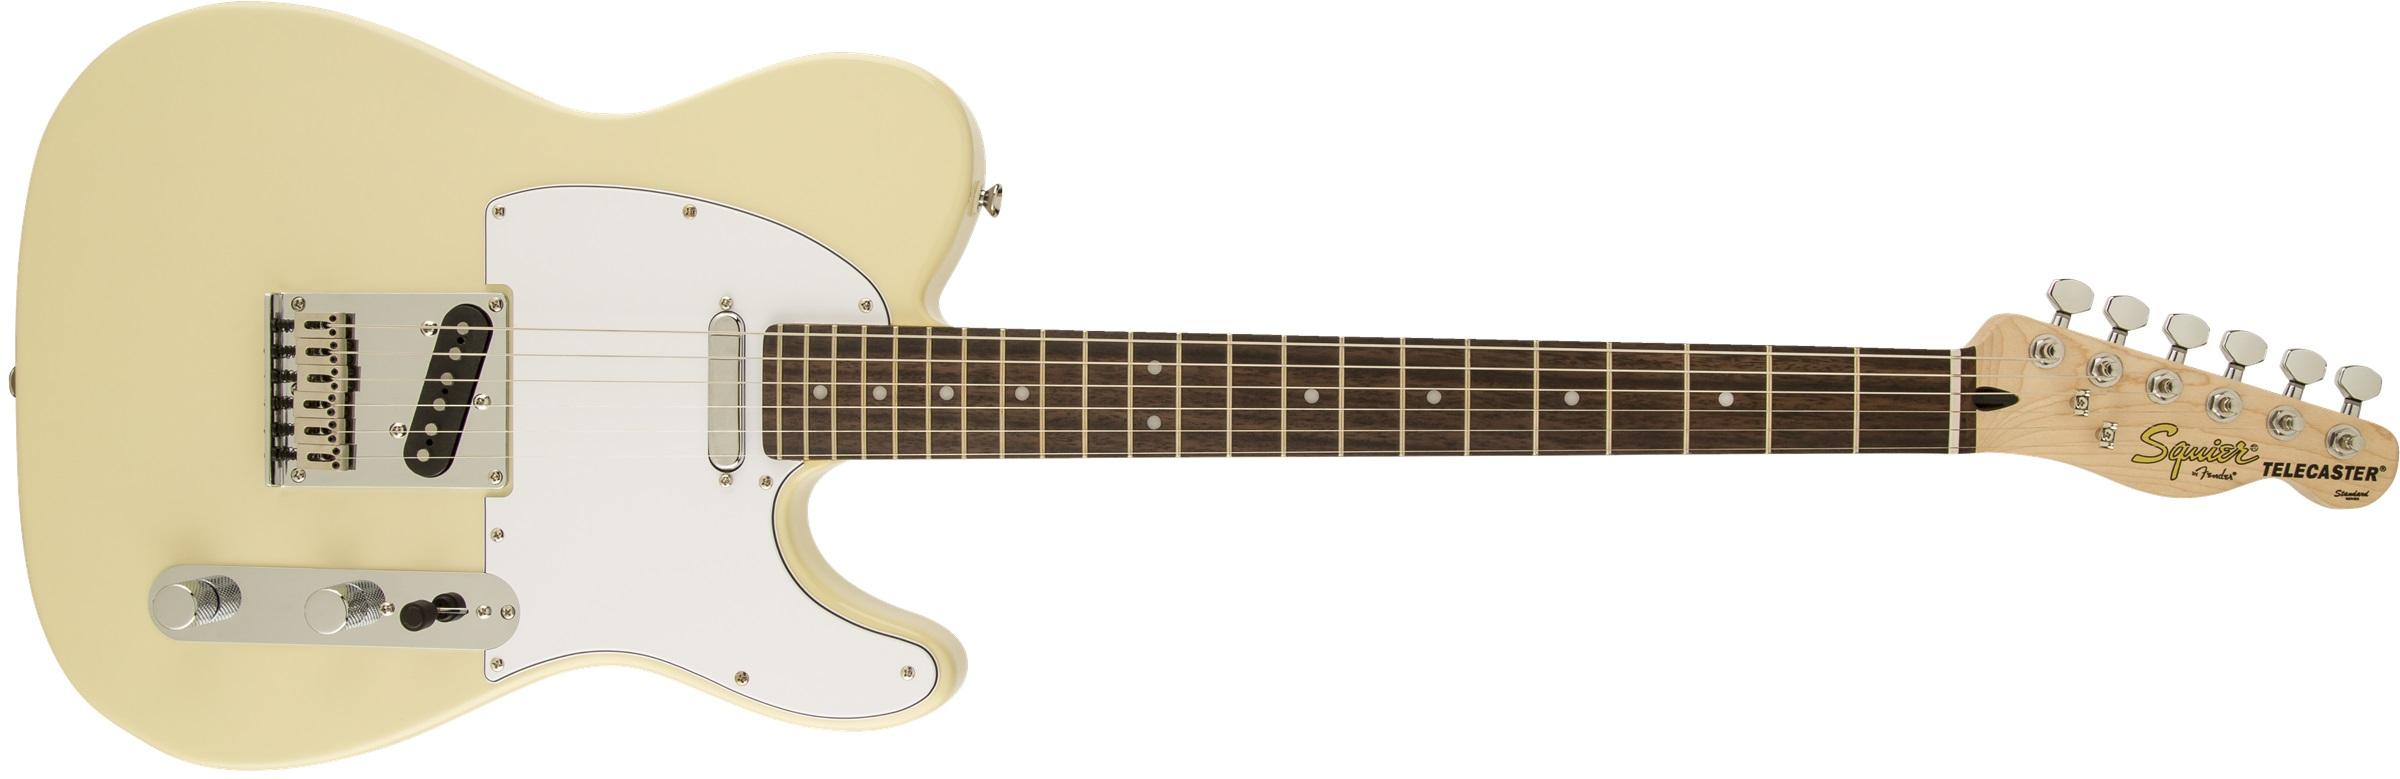 Fender Squier Standard Telecaster LRL VB